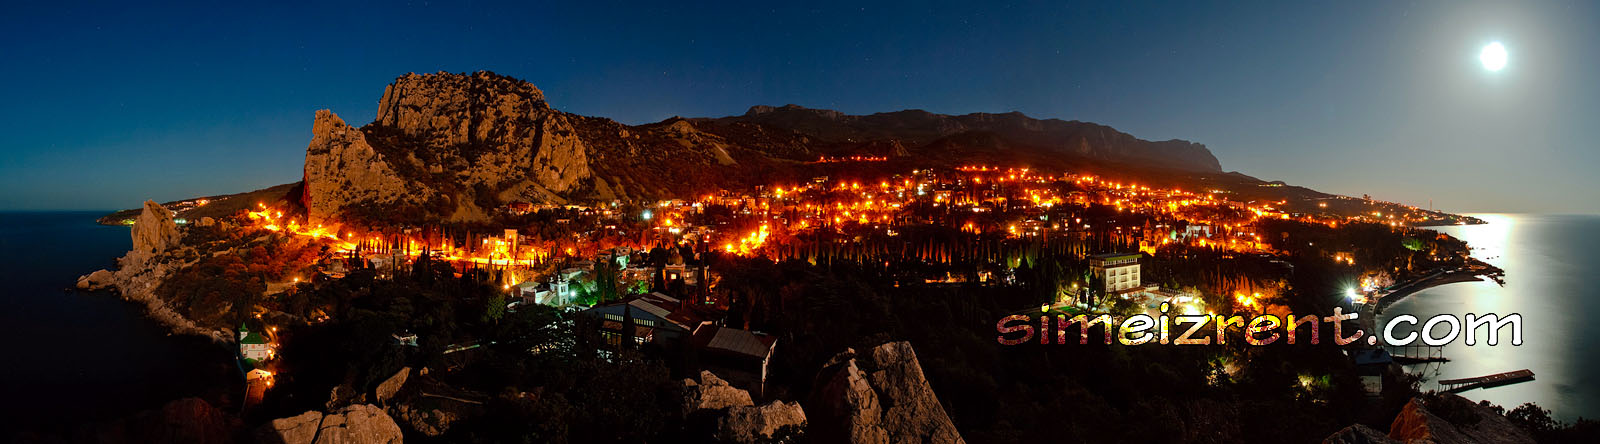 Крым, Симеиз, вид на Симеиз со скалы Дива, панорама